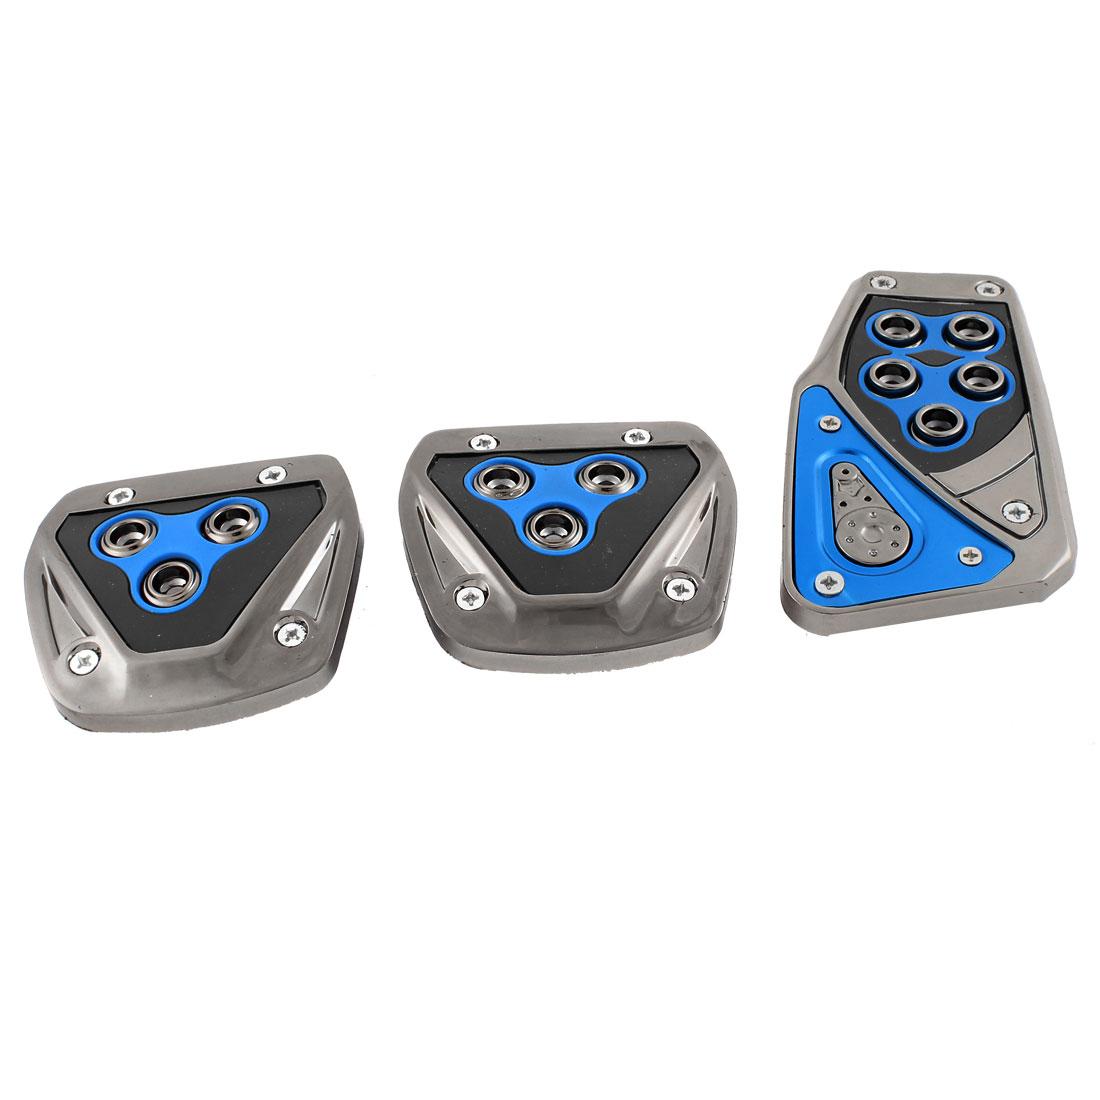 3 in 1 Antislip Design Car Gas Clutch Brake Foot Pedal Pad Cover Black Blue